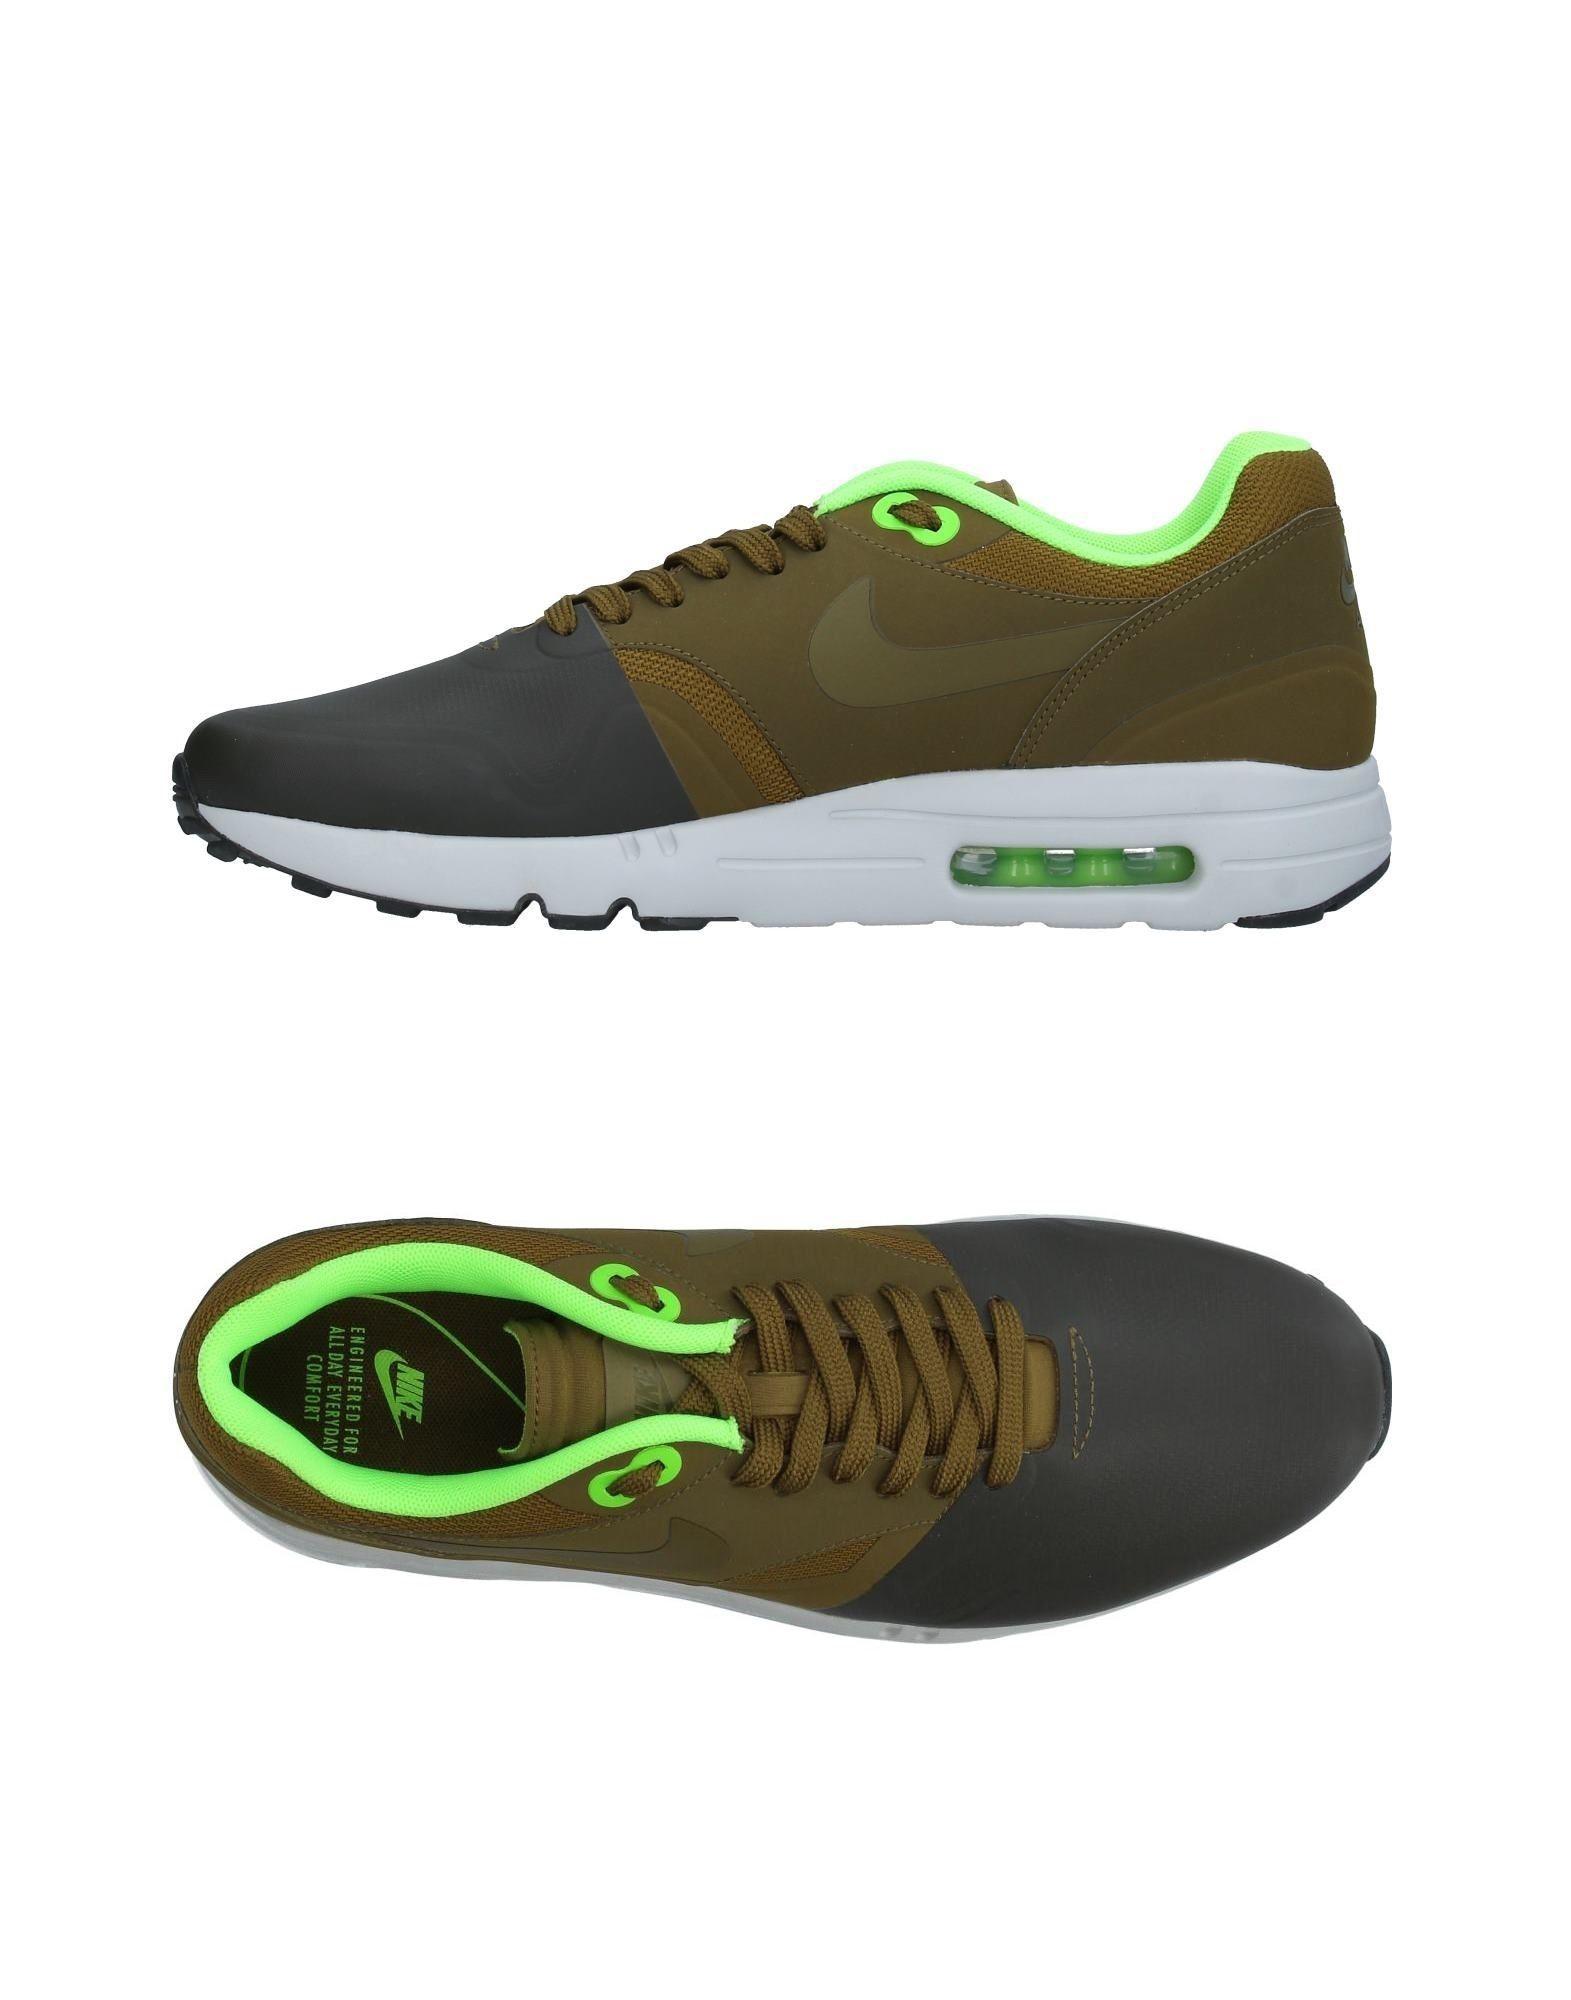 Moda Sneakers Nike Uomo Uomo Nike - 11335781KH 6ccd02